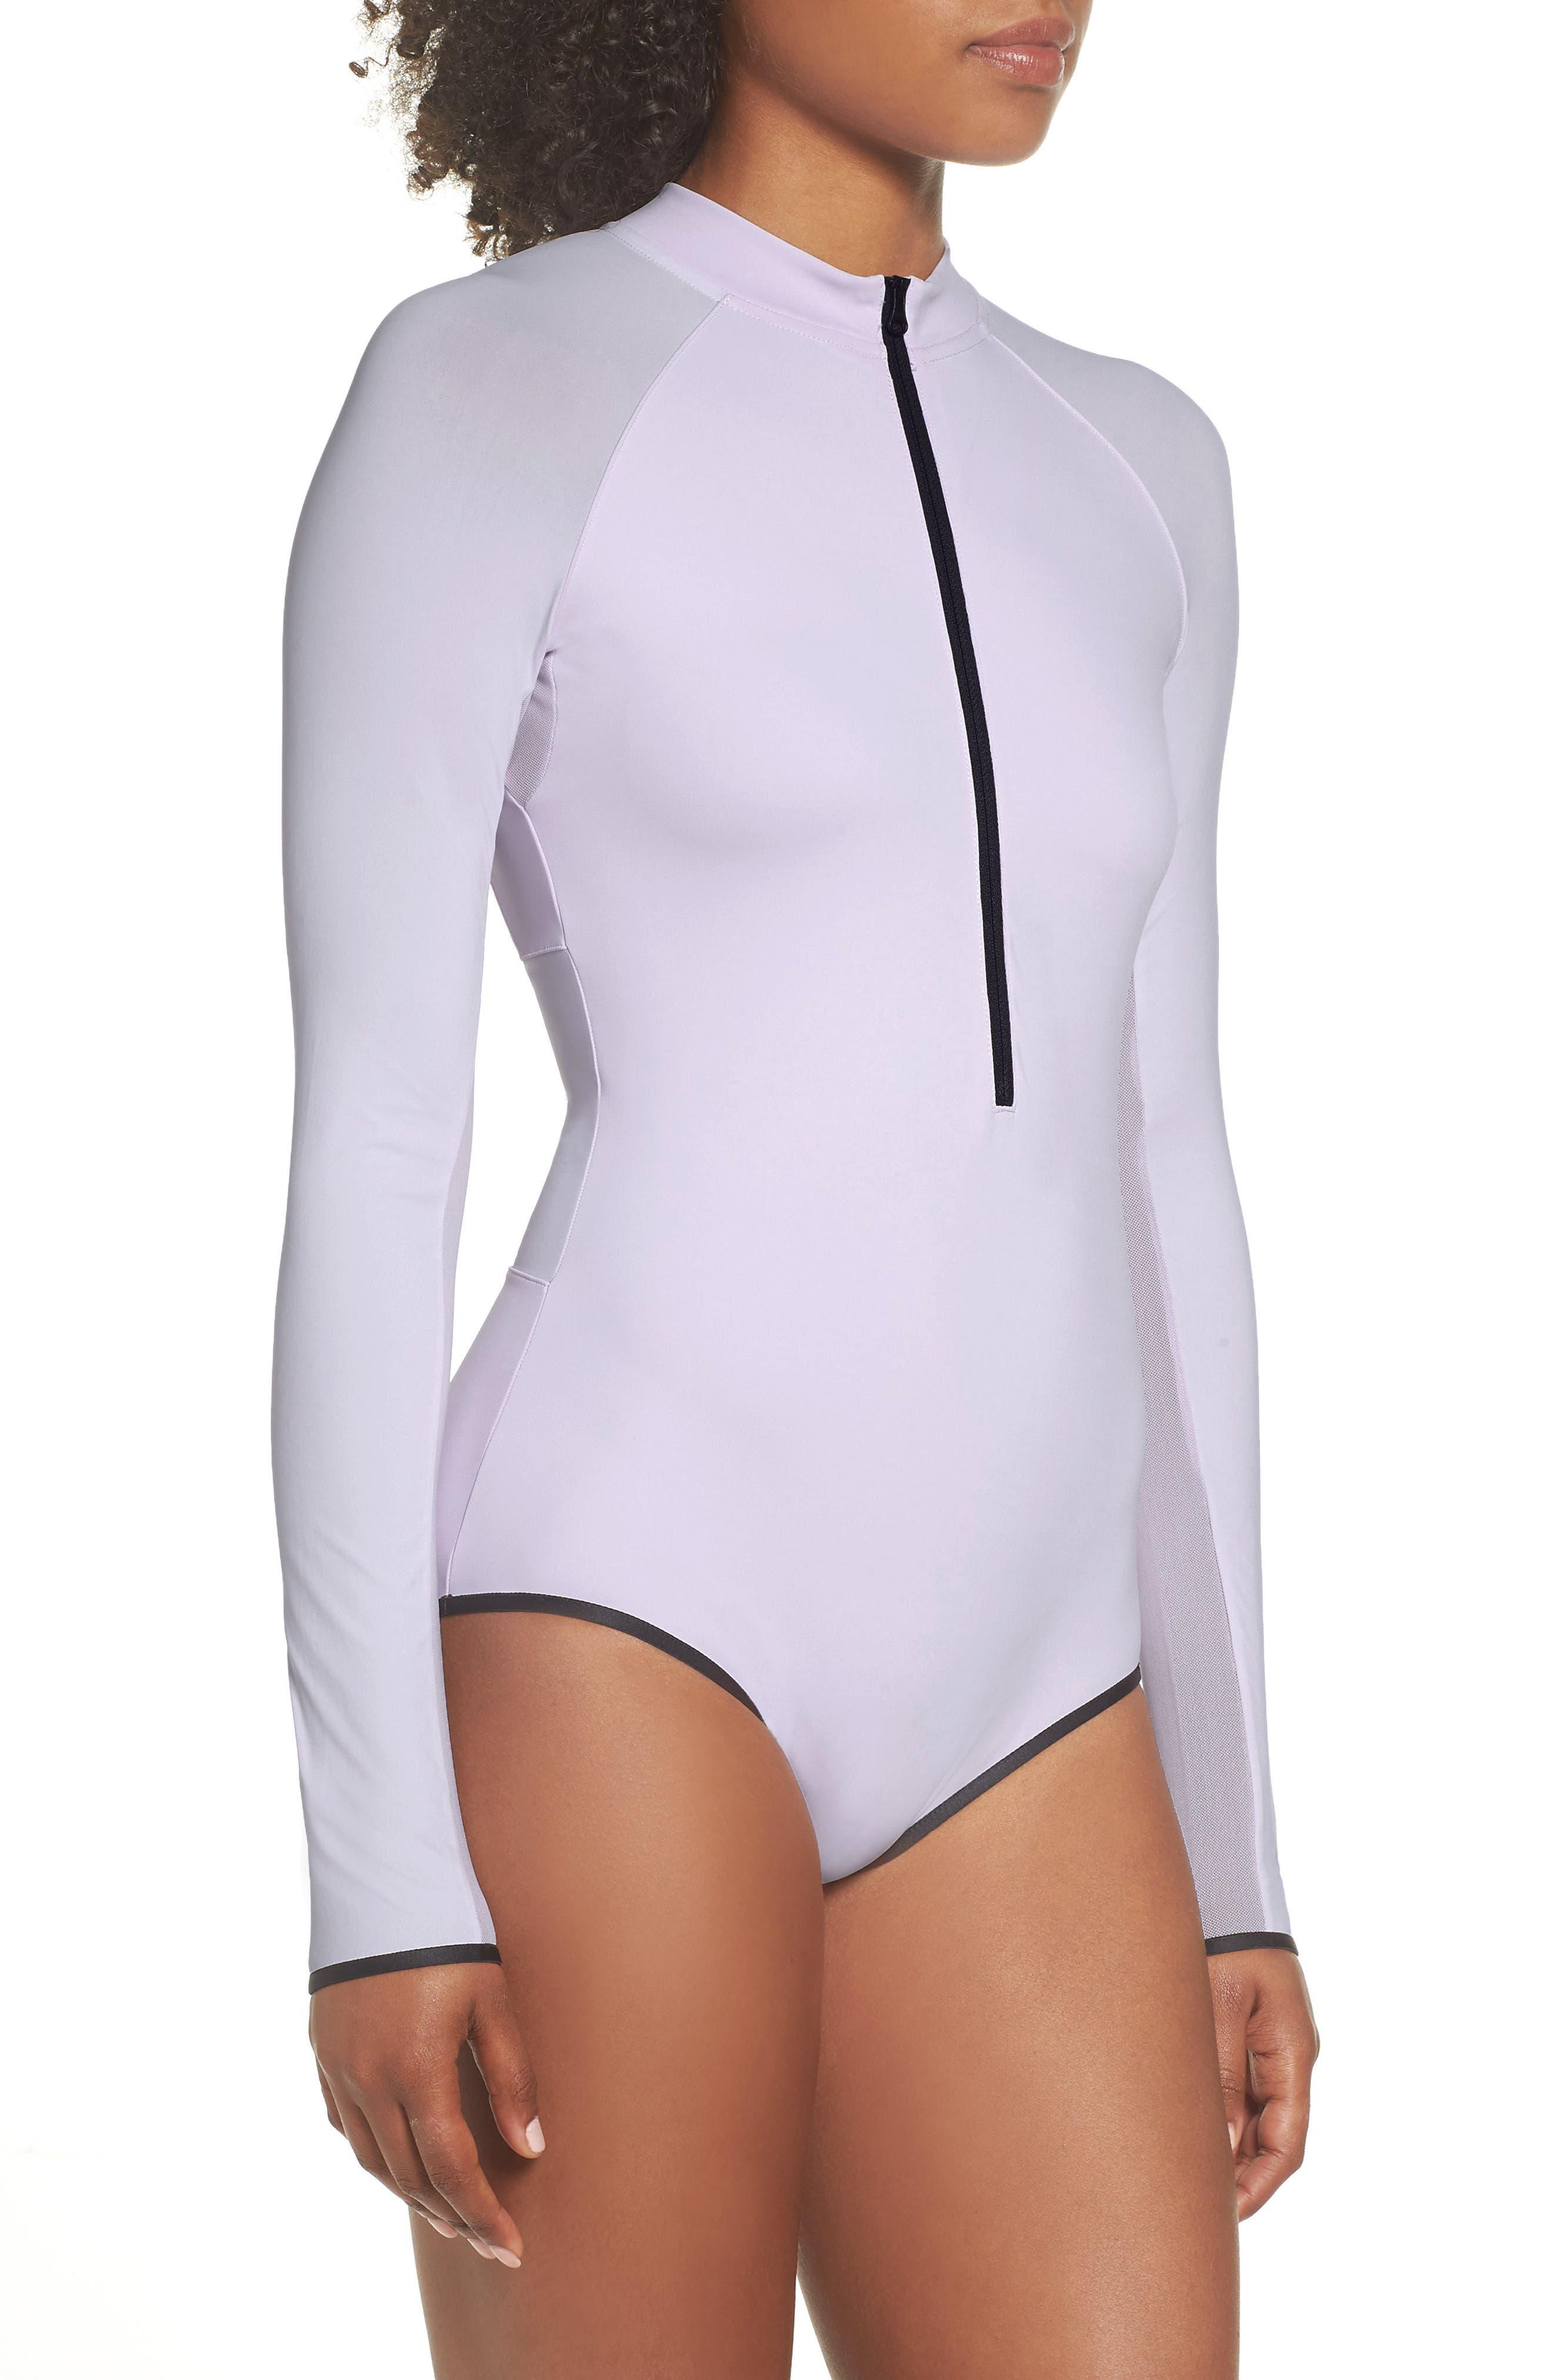 NRG Women's Dri-FIT Long Sleeve Bodysuit,                             Alternate thumbnail 4, color,                             509